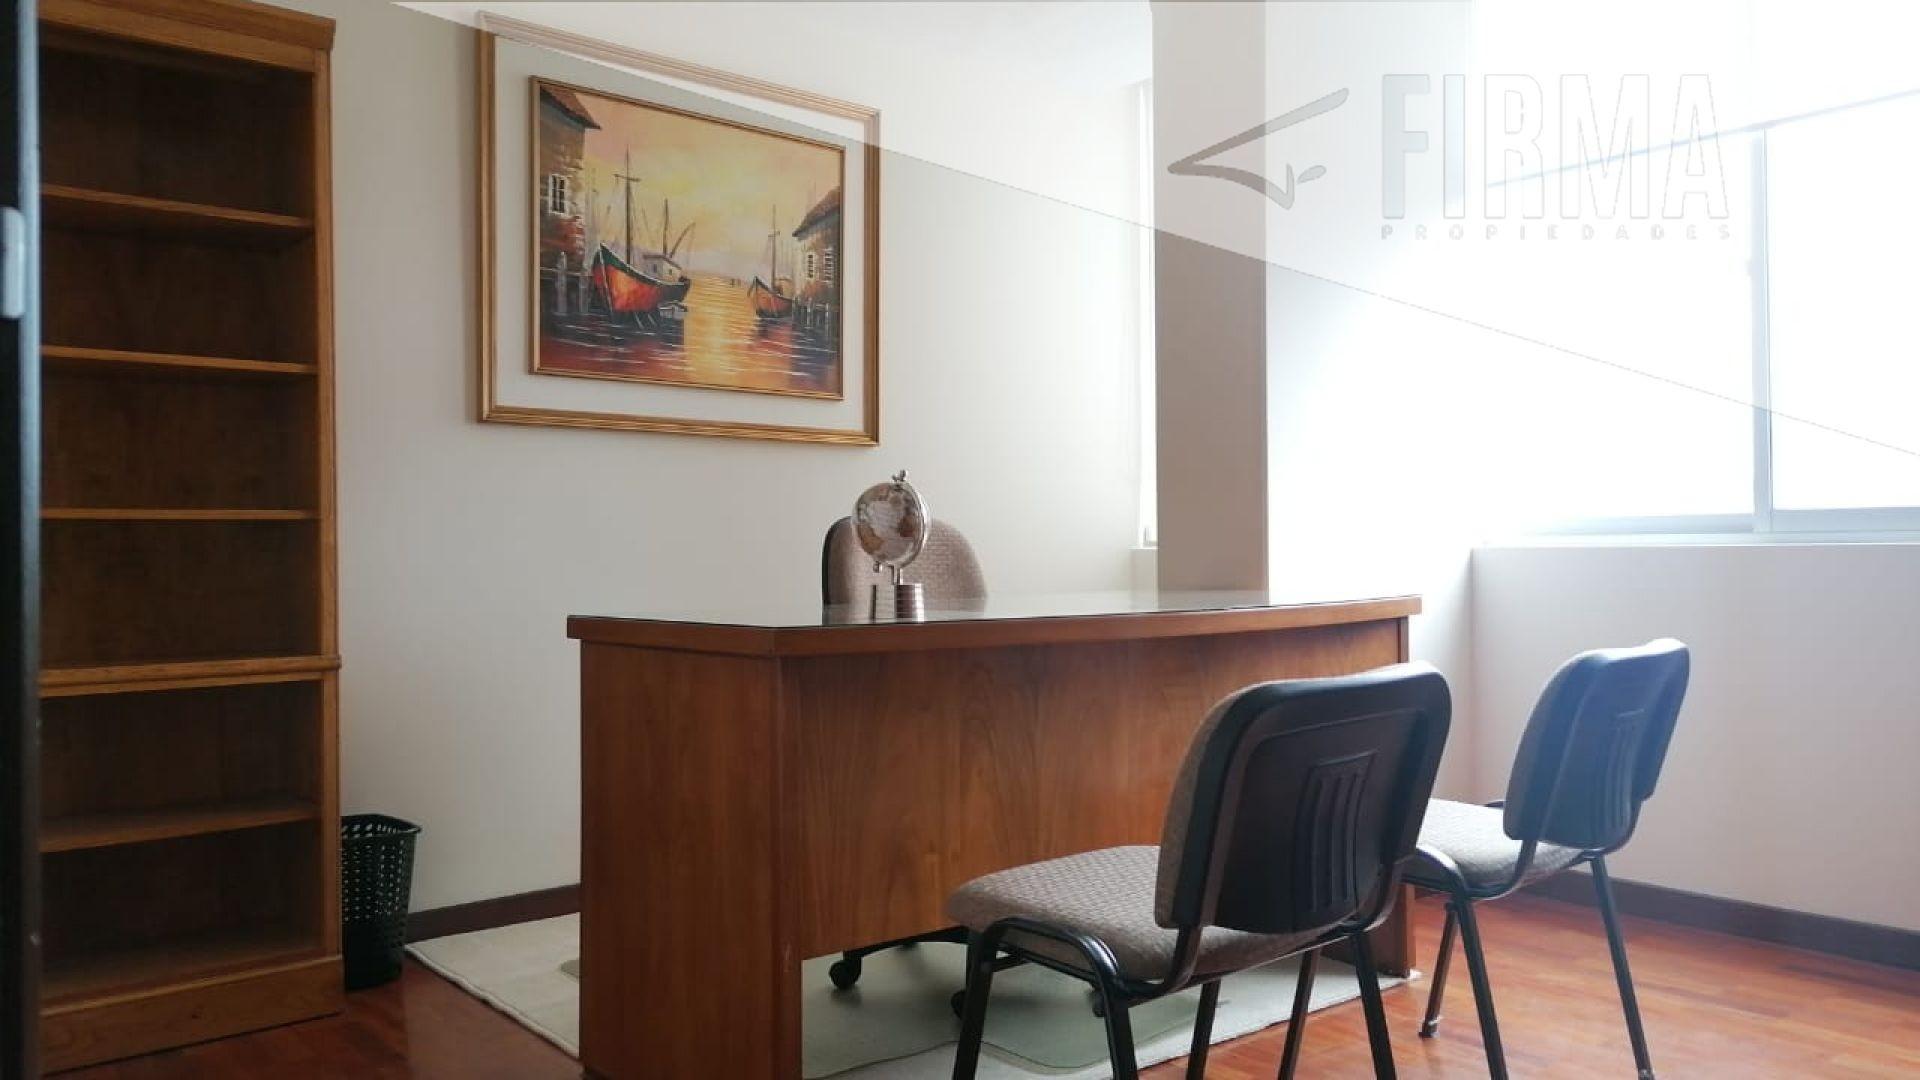 Departamento en Alquiler ALQUILA ESTE PENTHOUSE AMOBLADO EN CALACOTO Foto 17